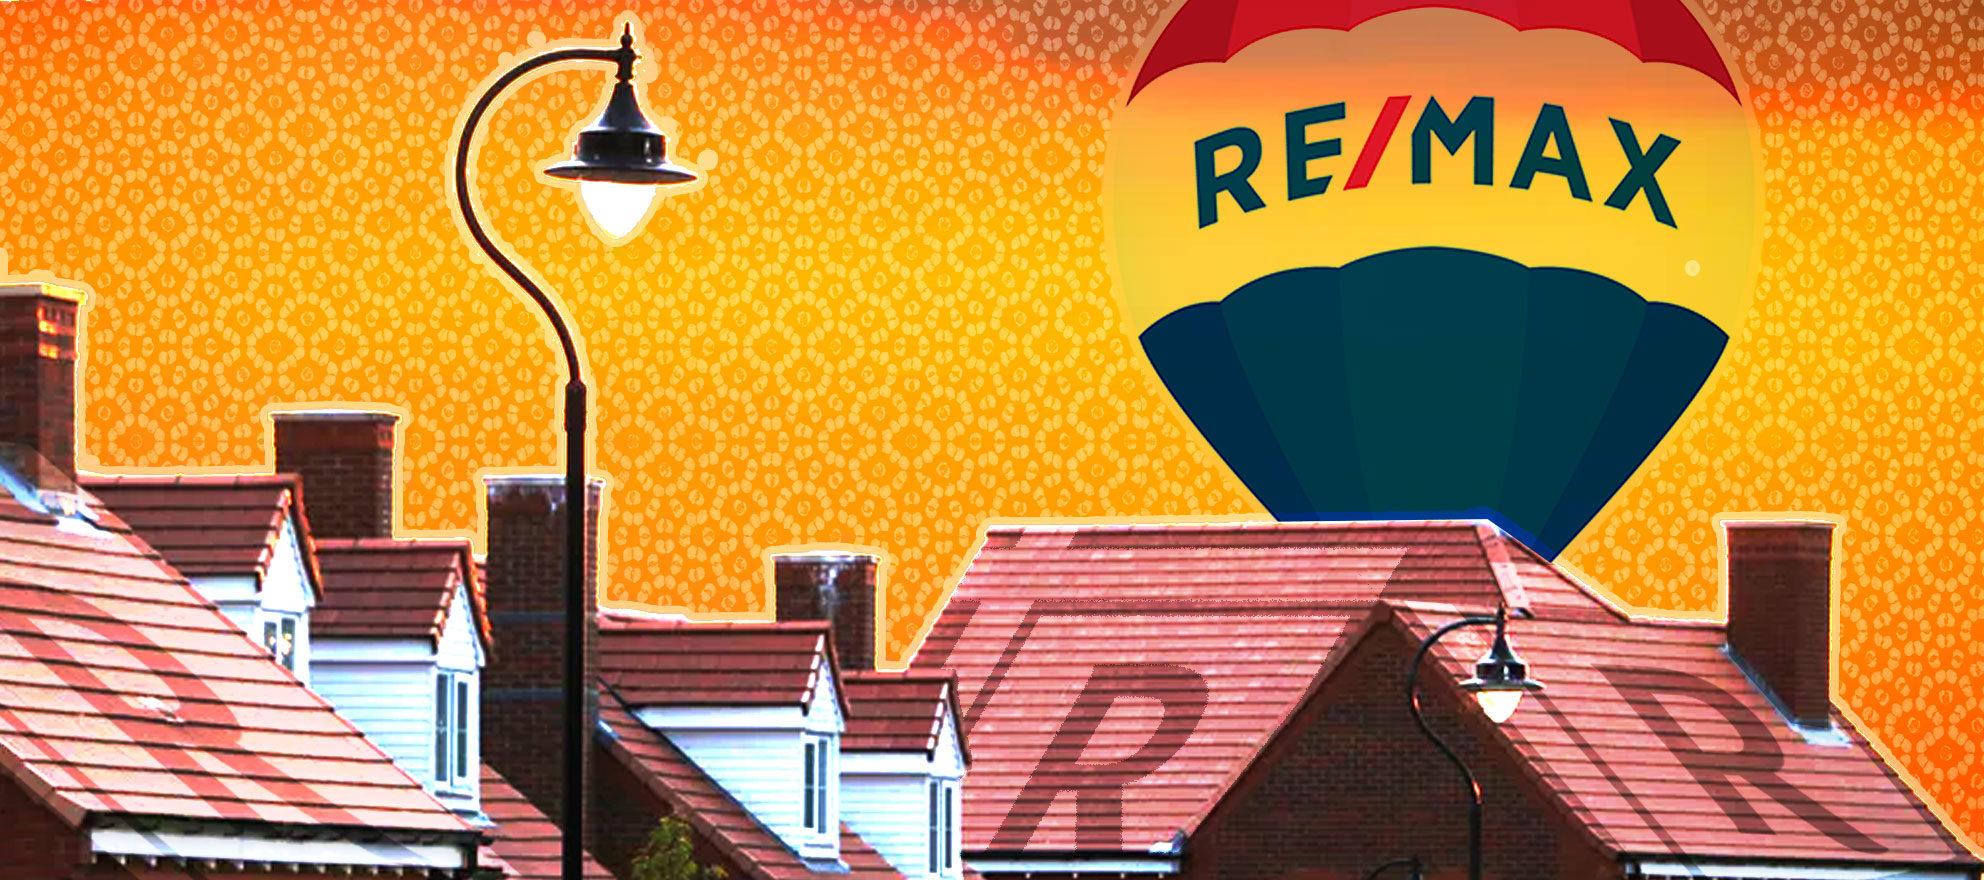 RE/MAX should buy Redfin